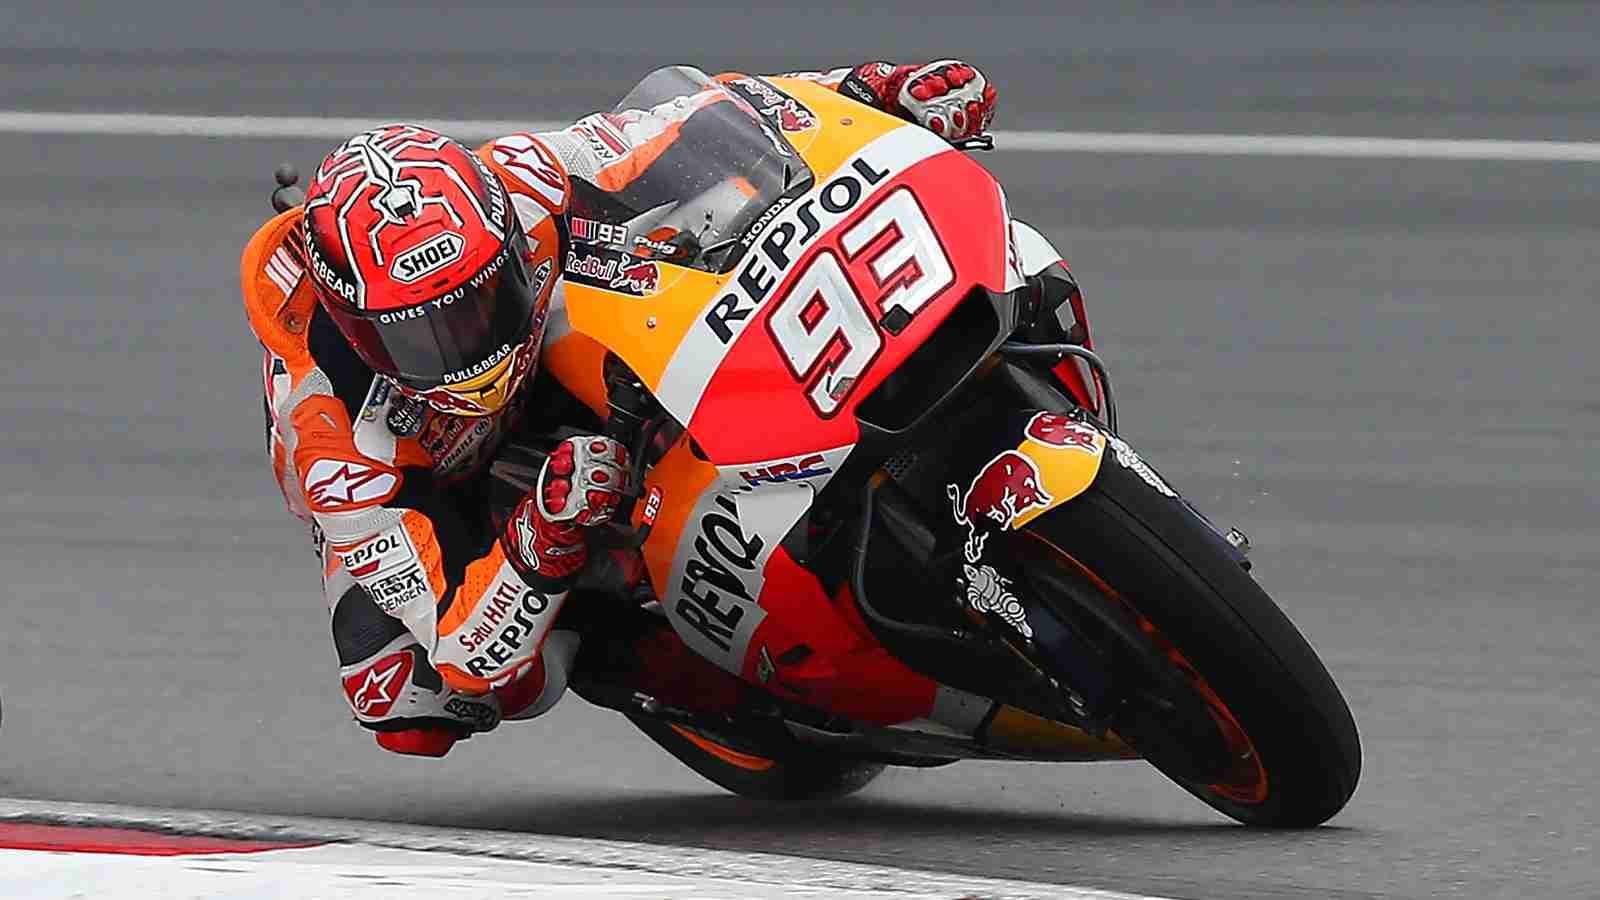 Honda wins MotoGP 2017 Constructor Title